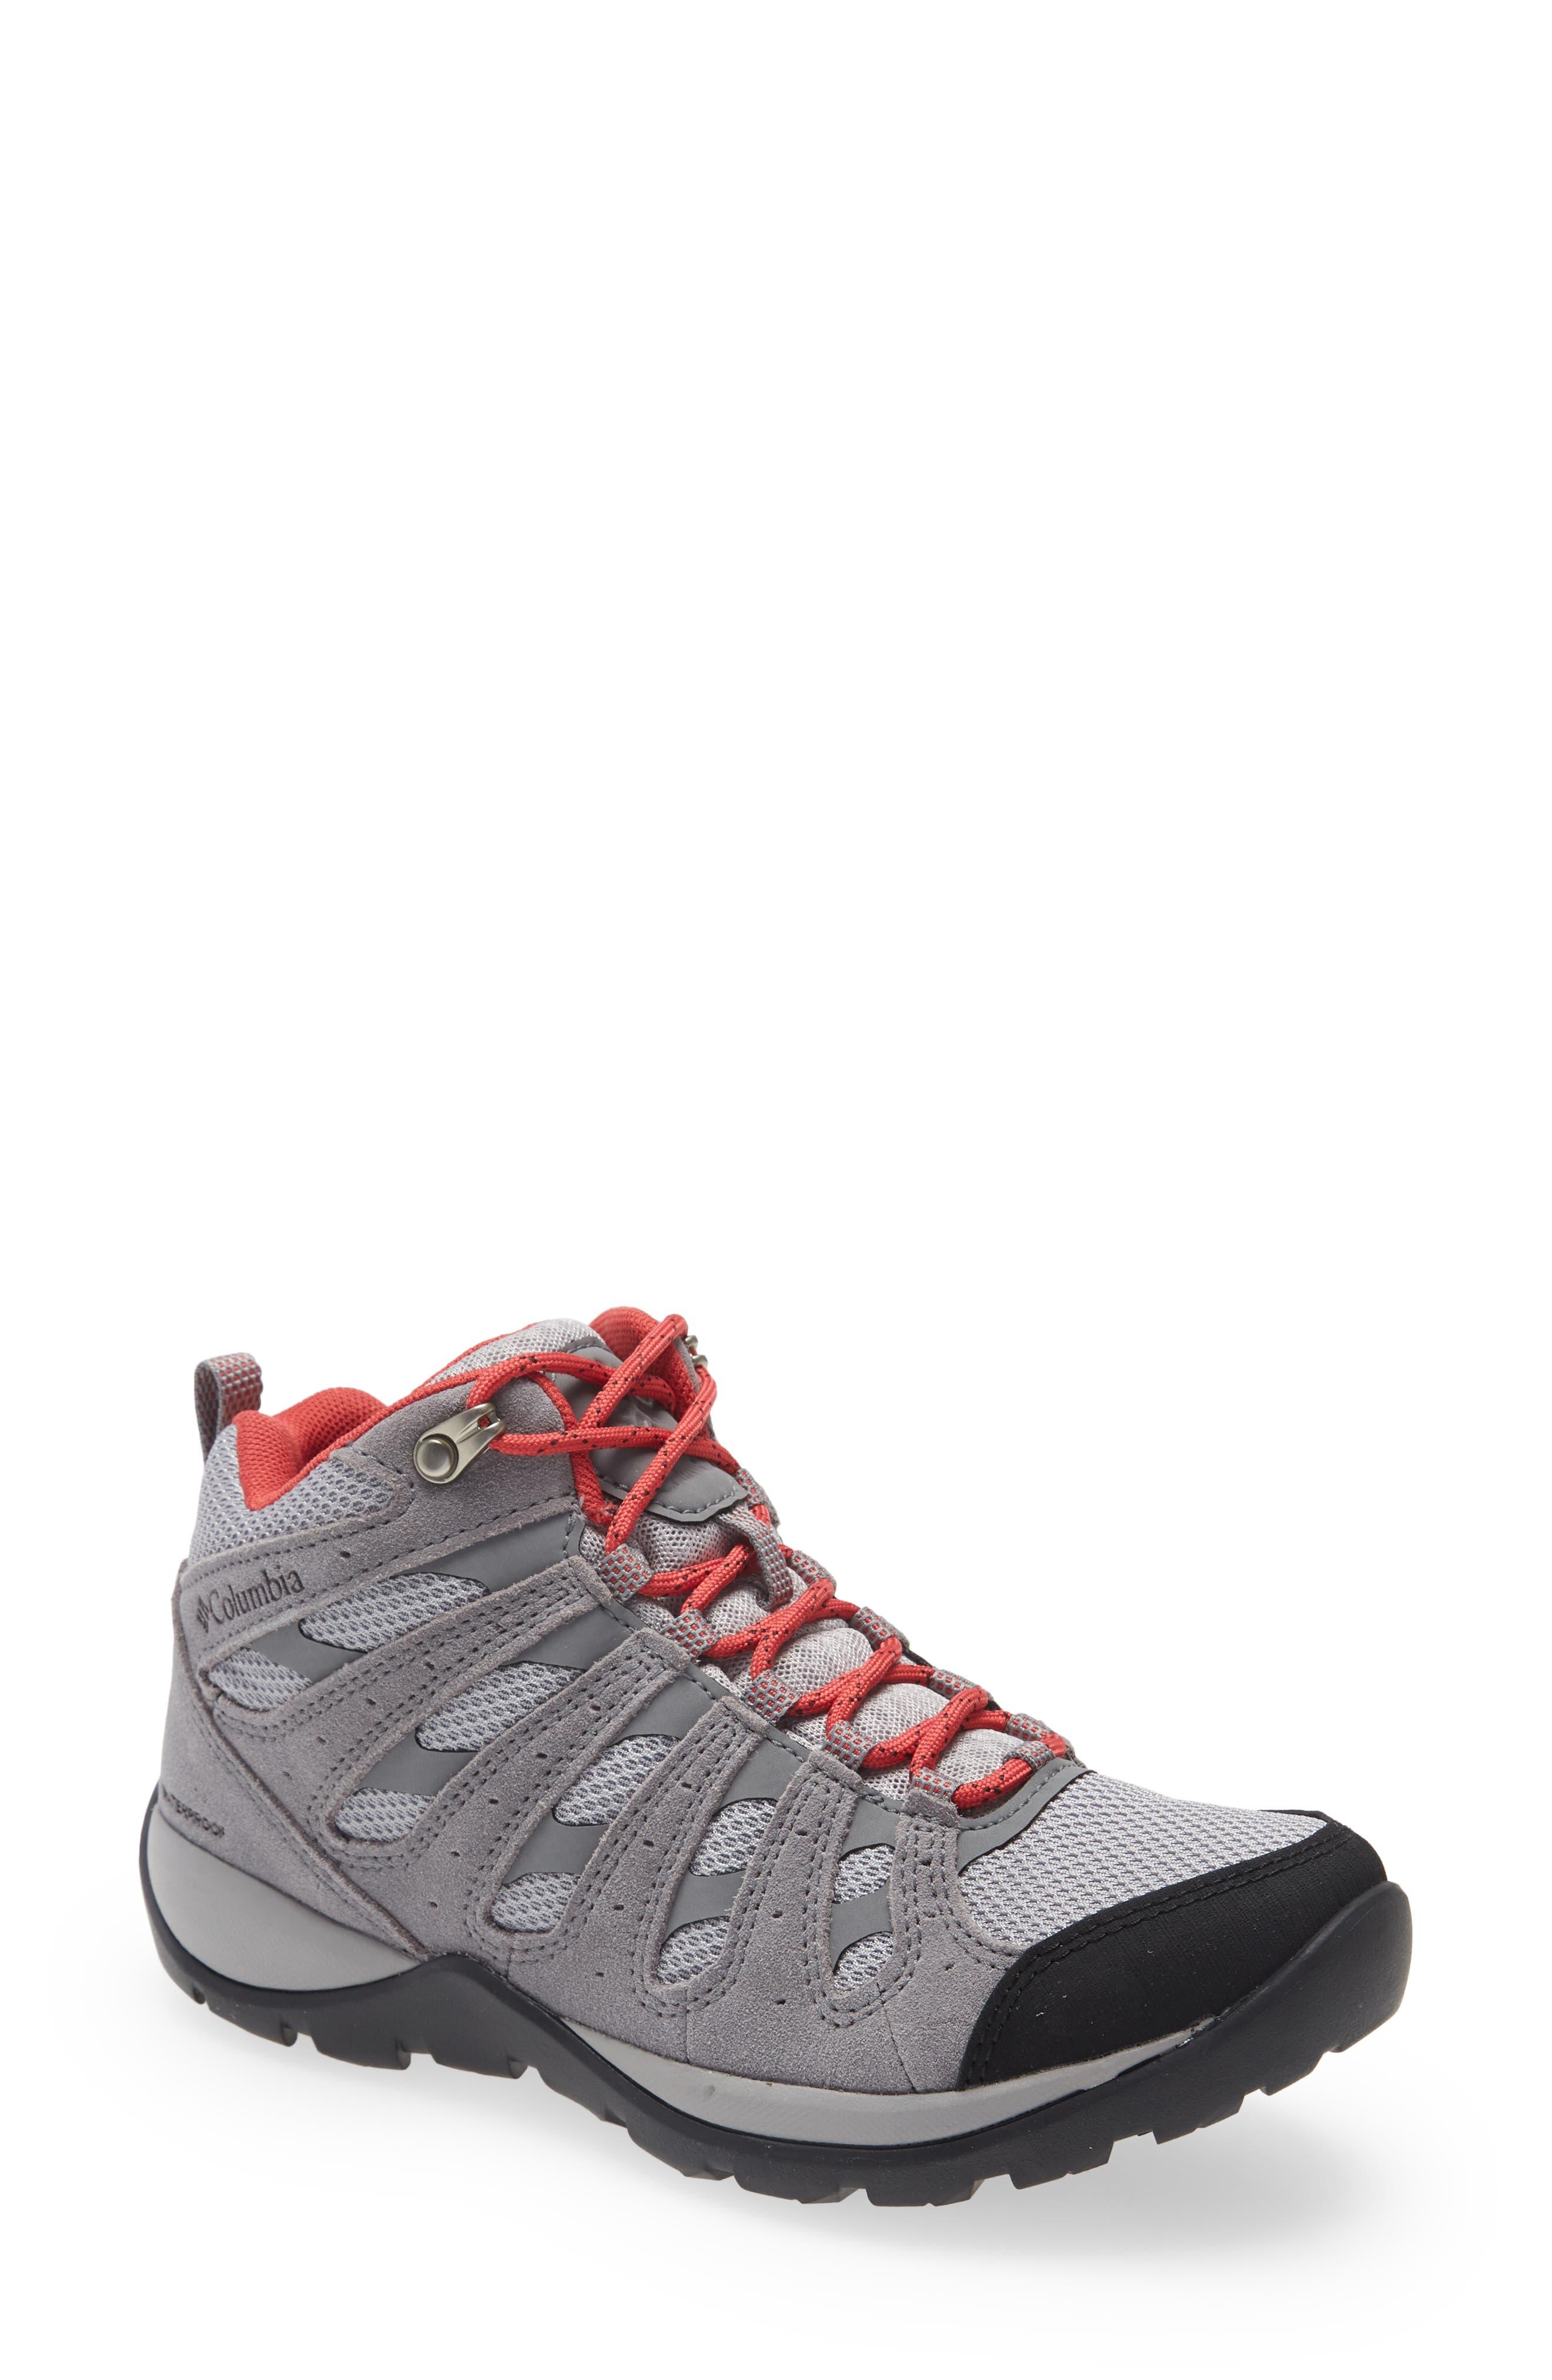 Redmond V2 Mid Waterproof Hiking Boot